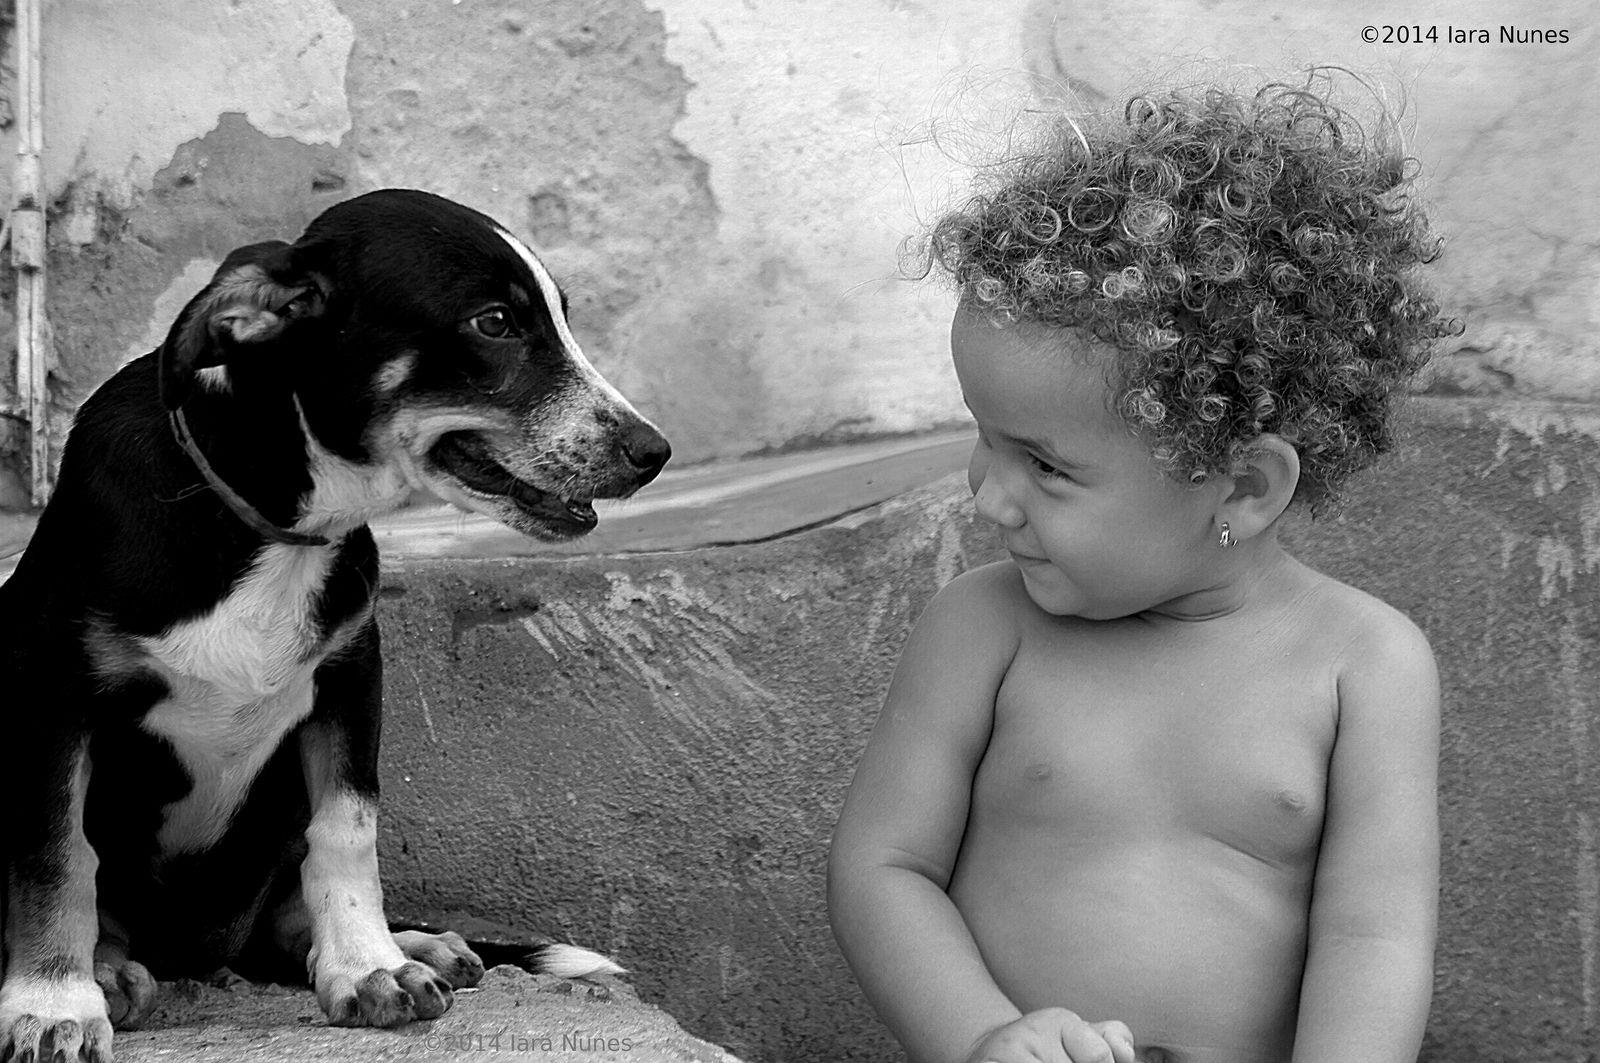 Olhares Inocentes | by Iara Nunes84